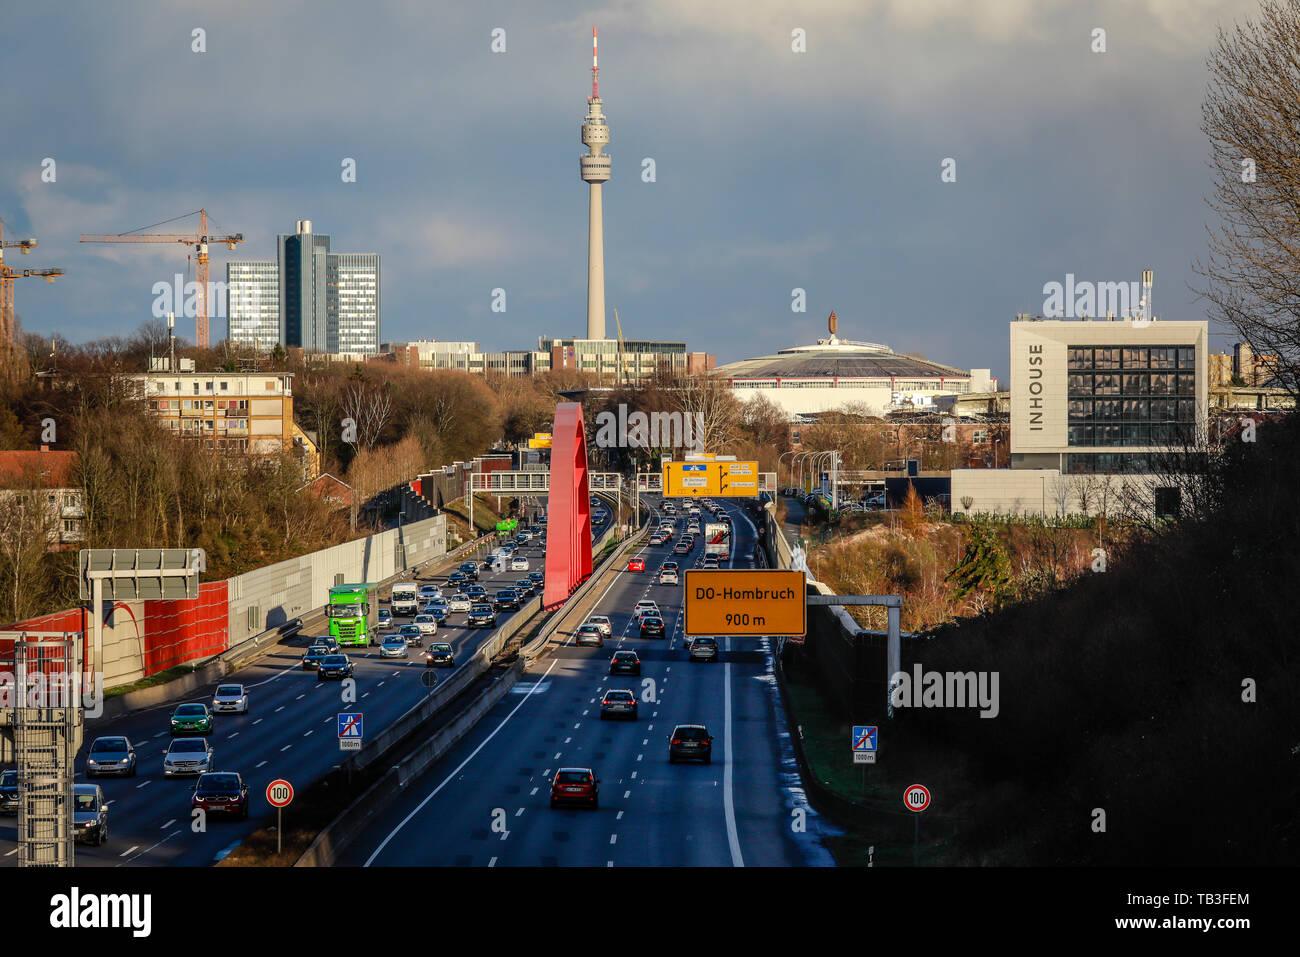 07.03.2019, Dortmund, North Rhine-Westphalia, Germany - City view with motorway A40, Westfalenhalle and radio tower. 00X190307D130CAROEX.JPG [MODEL RE - Stock Image